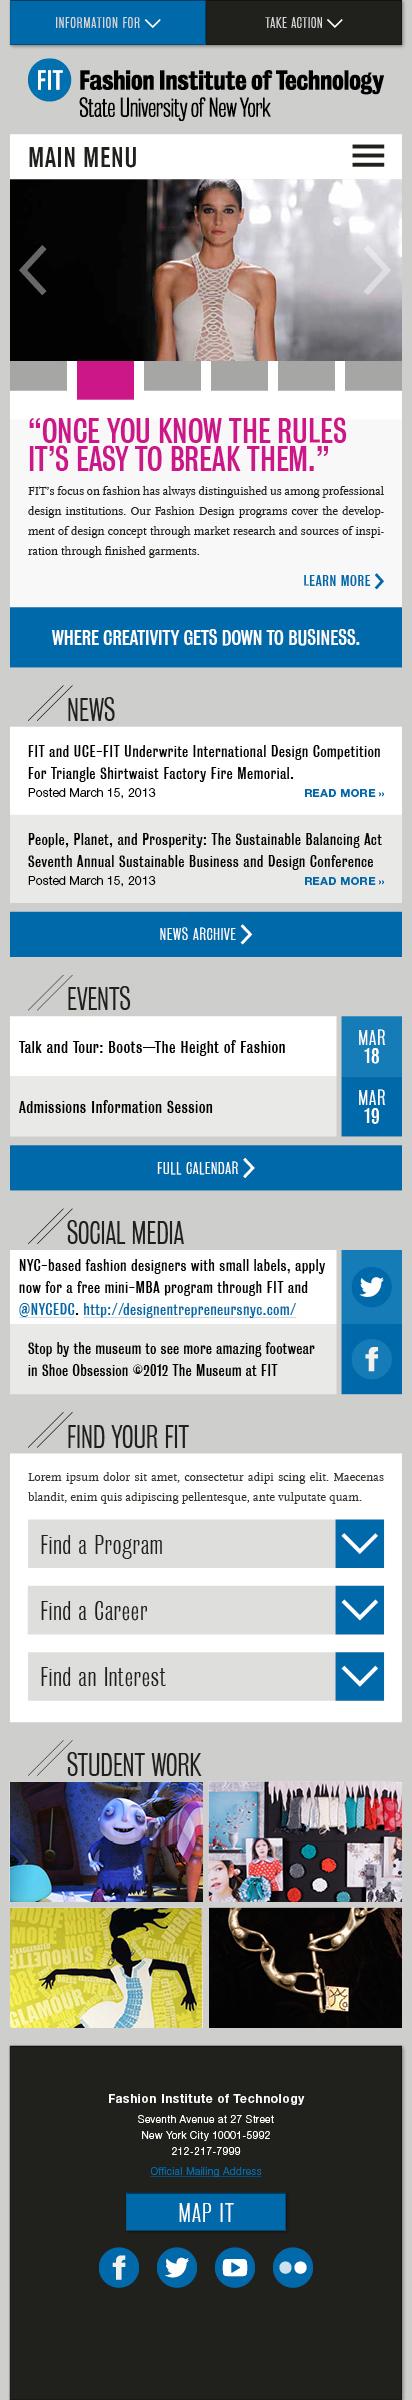 mStoner_FITNYC_webTemplates_comp5_mobile.jpg